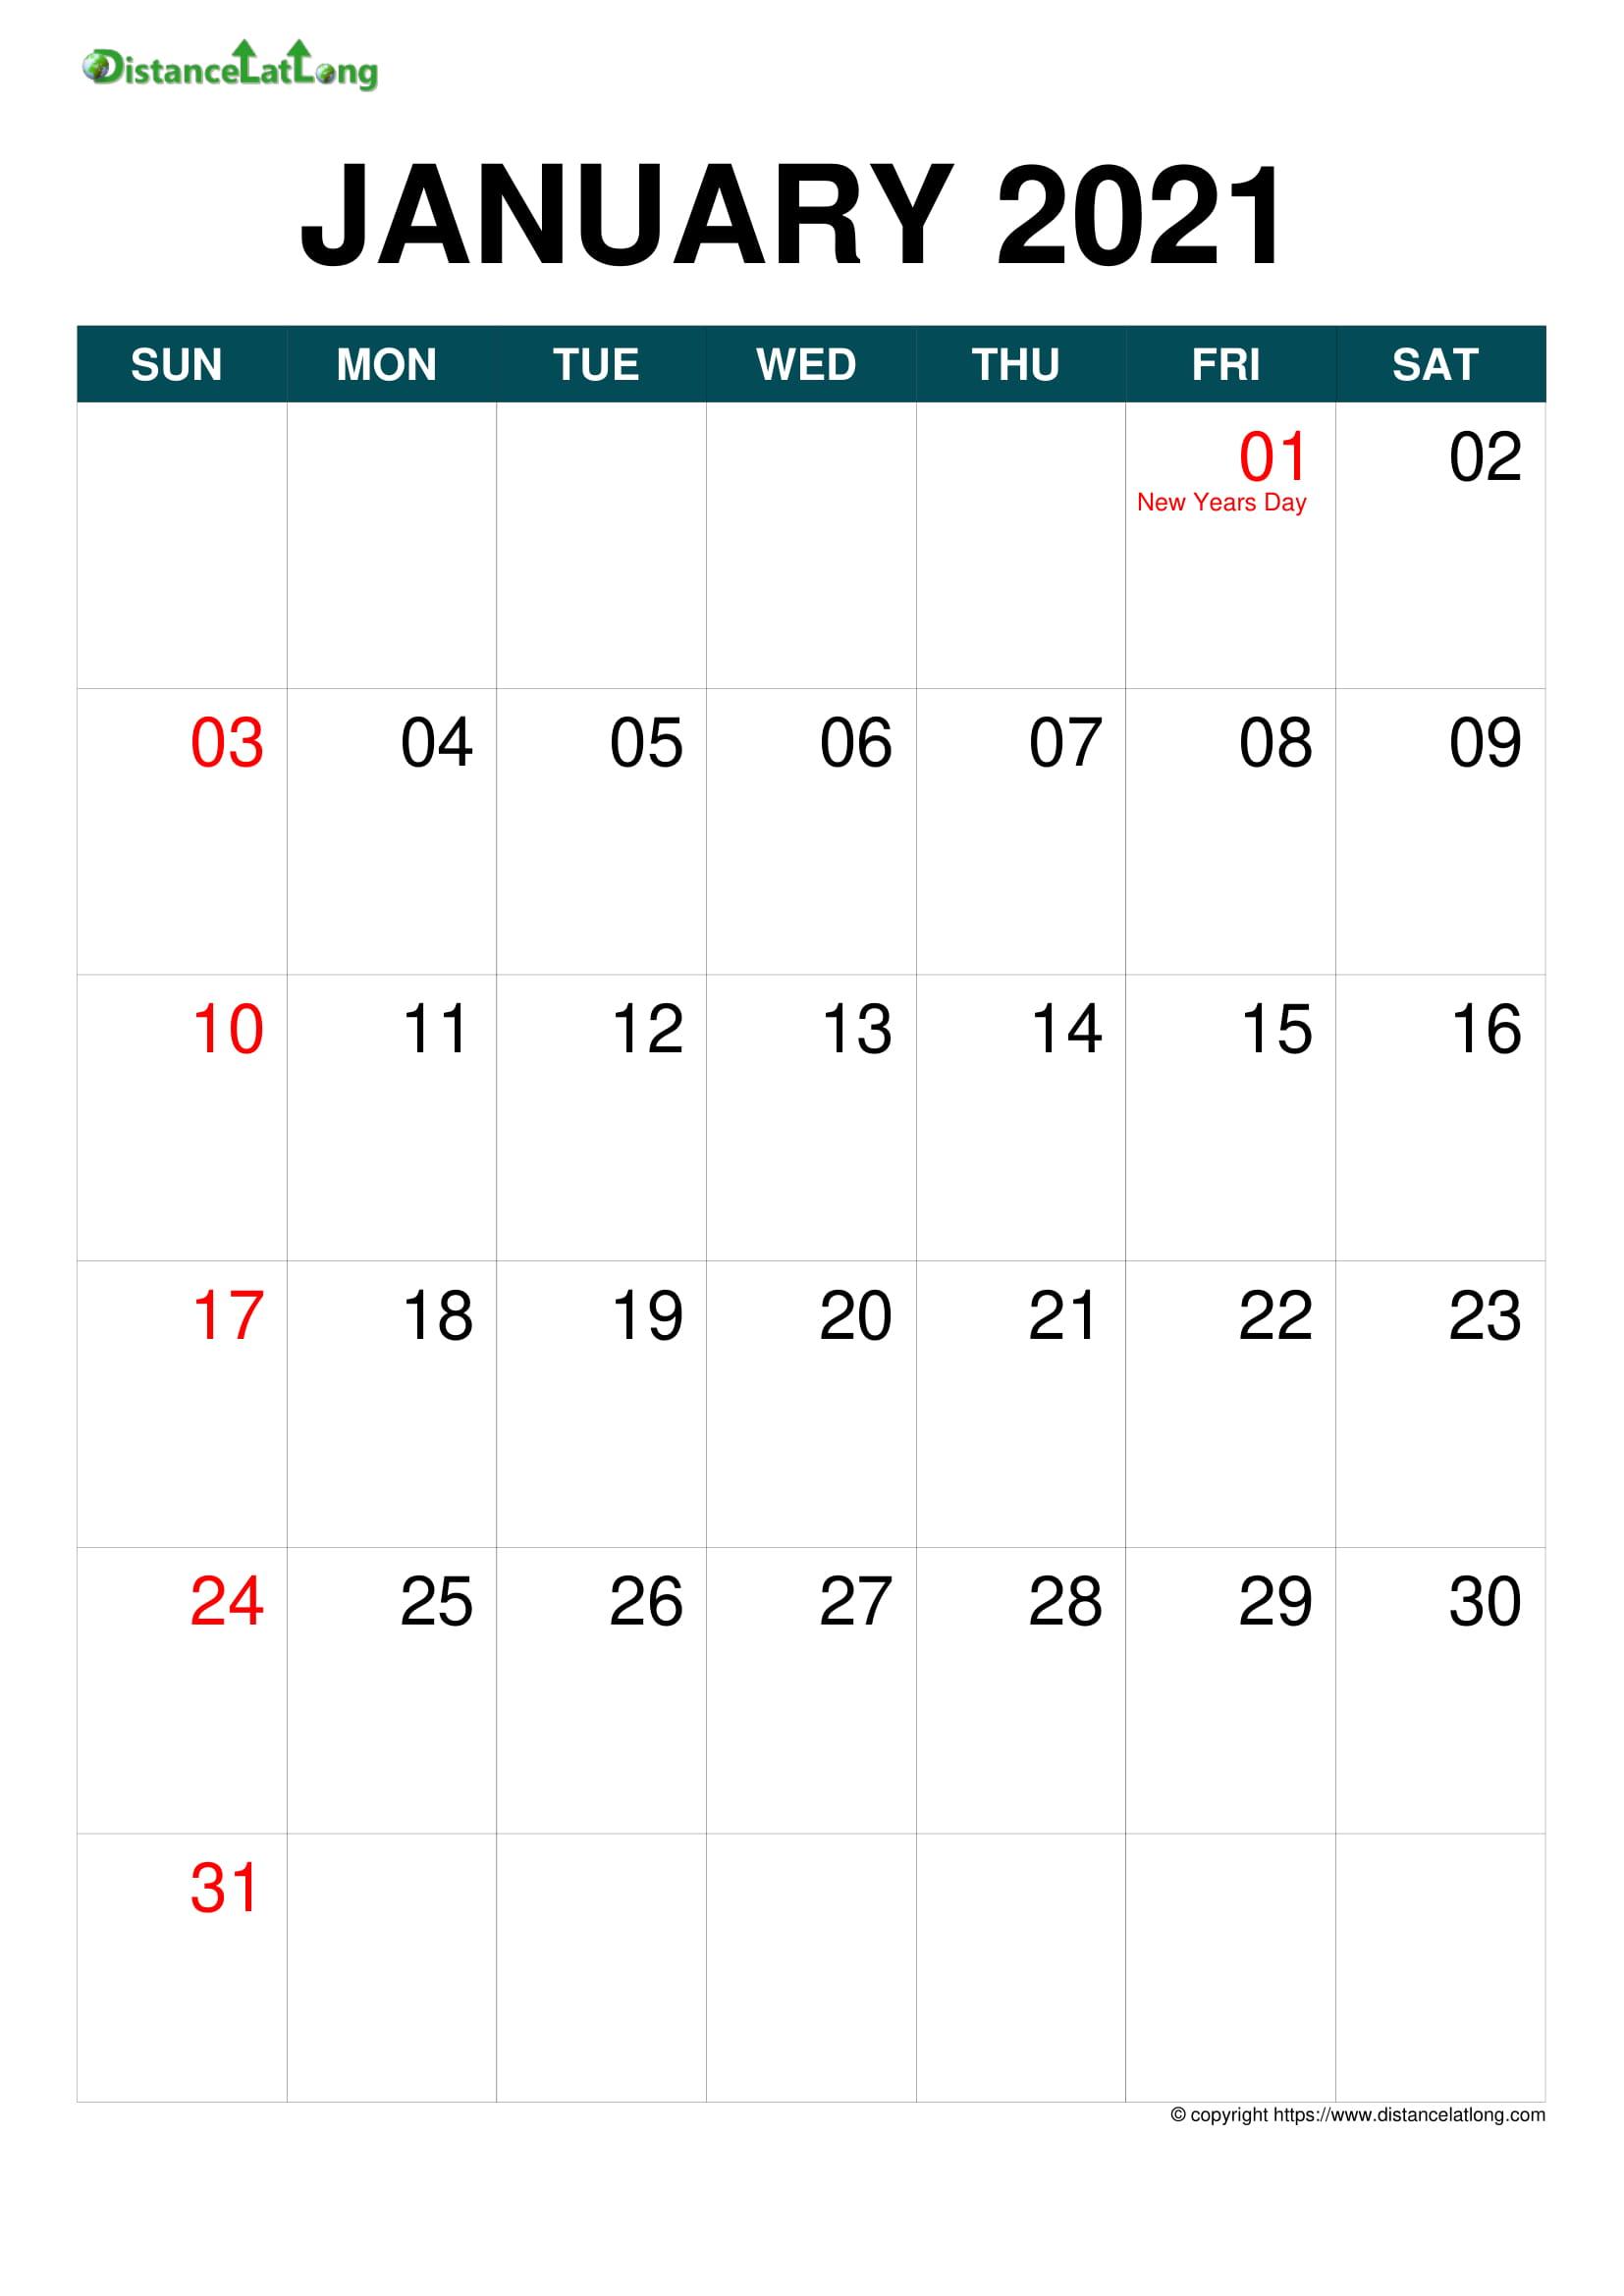 Saturday Through Sunday Calendar | Calendar Template inside Sunday Saturday Calendar Template